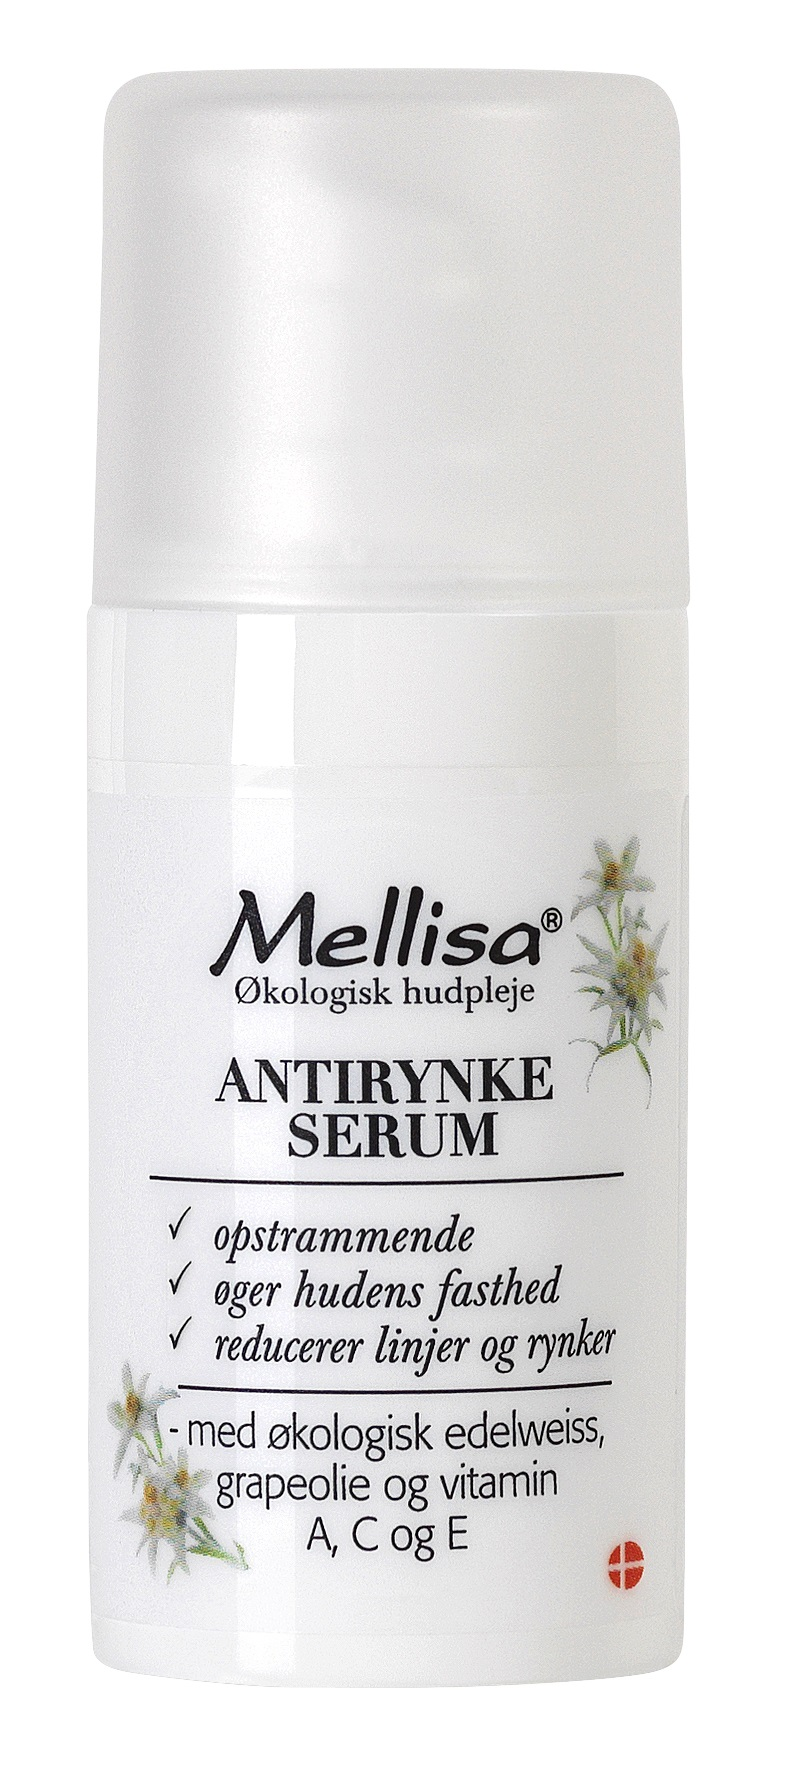 Billede af Mellisa Serum Anti-rynke m. grape, edelweiss og alge - 15 ml